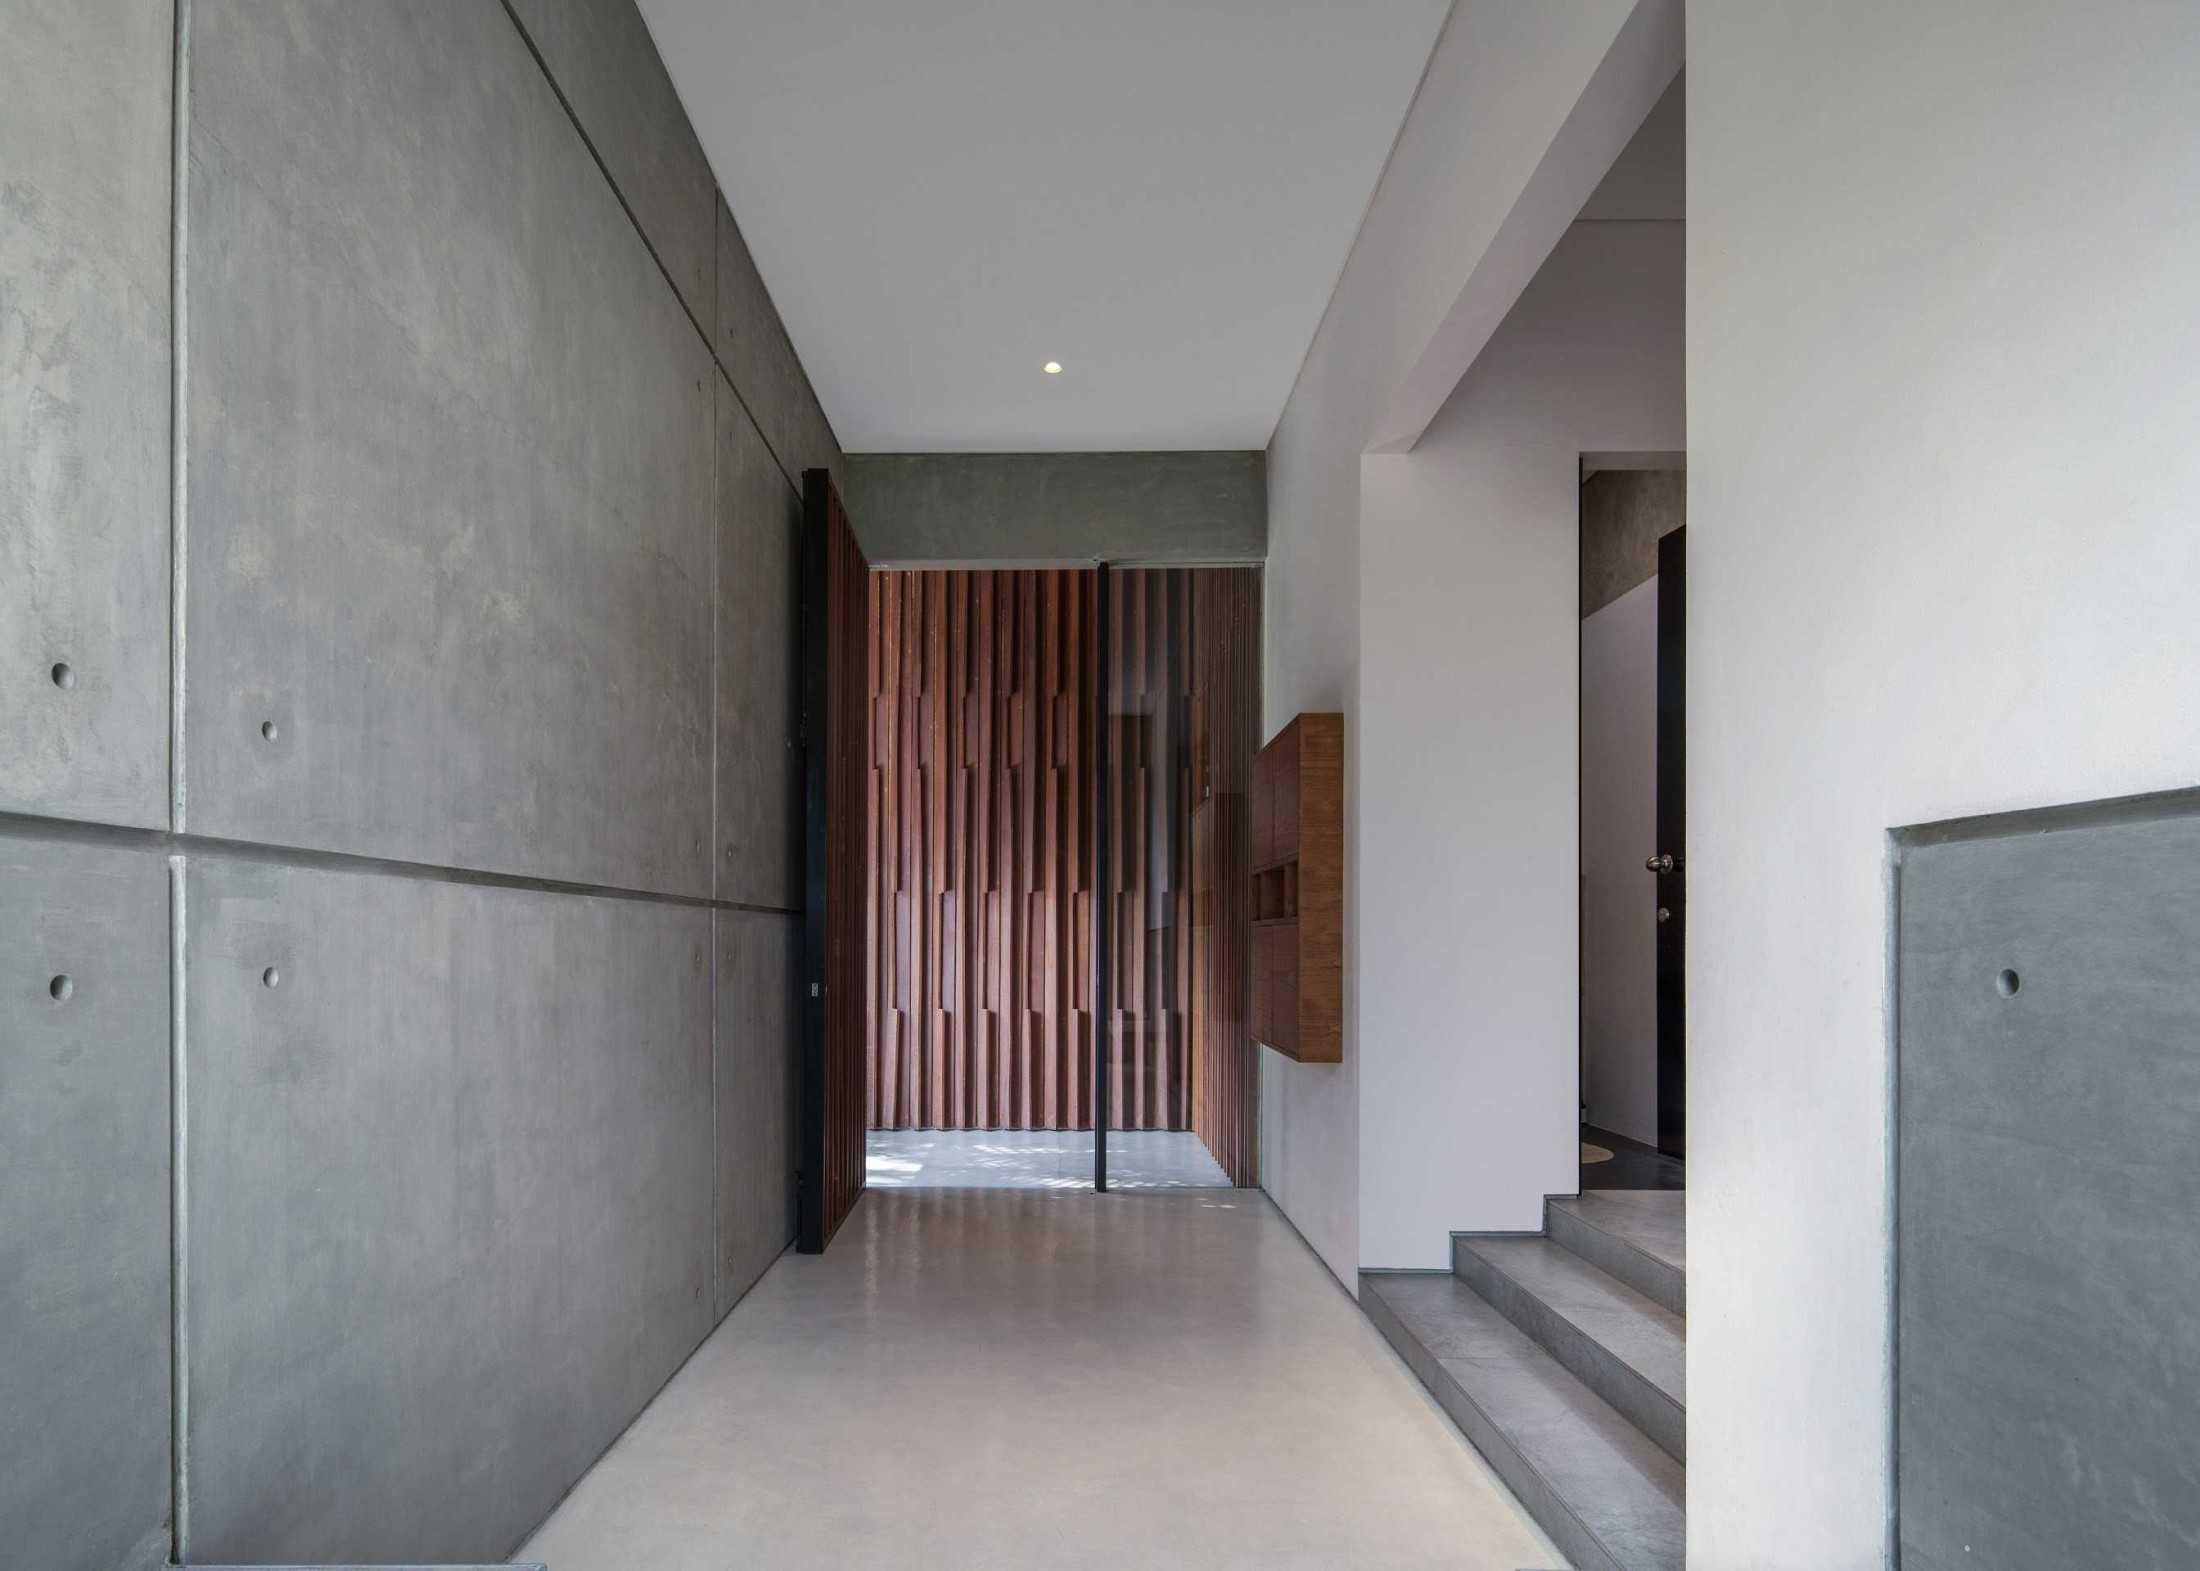 Jxa Studio Mokie House Kec. Cimanggis, Kota Depok, Jawa Barat, Indonesia Kec. Cimanggis, Kota Depok, Jawa Barat, Indonesia Jxa-Studio-Mokie-House  76221